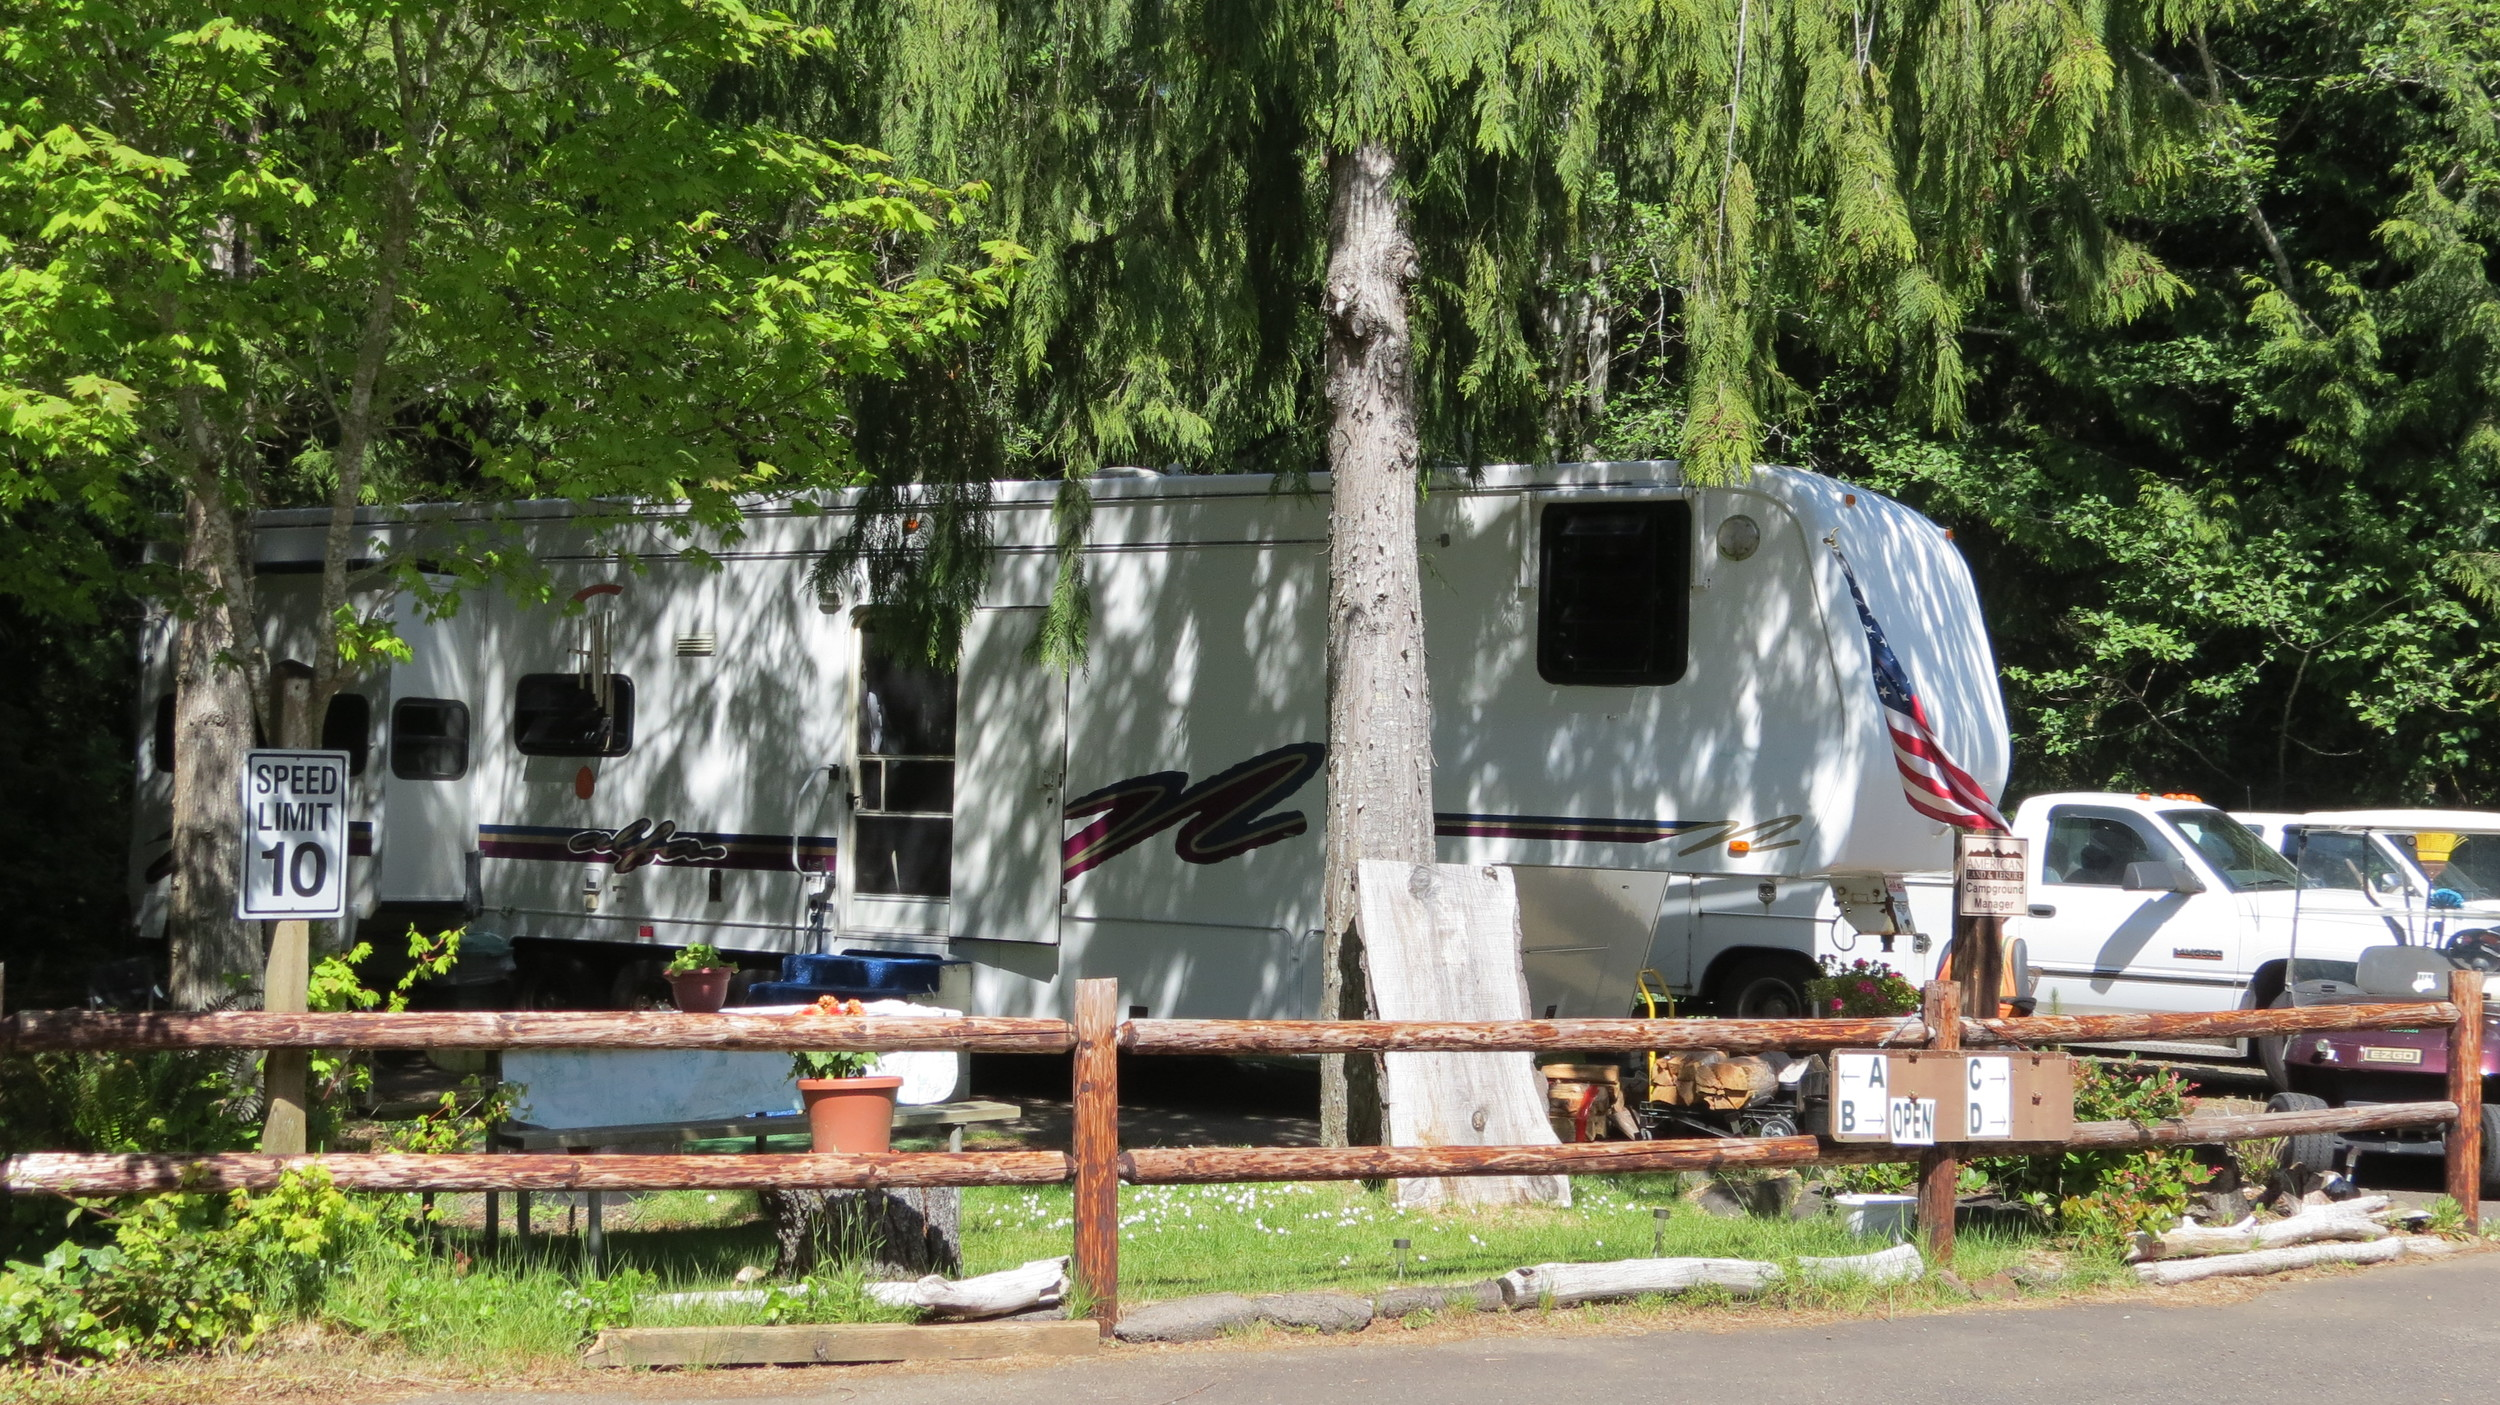 Loop A Host Site - Sutton Campground